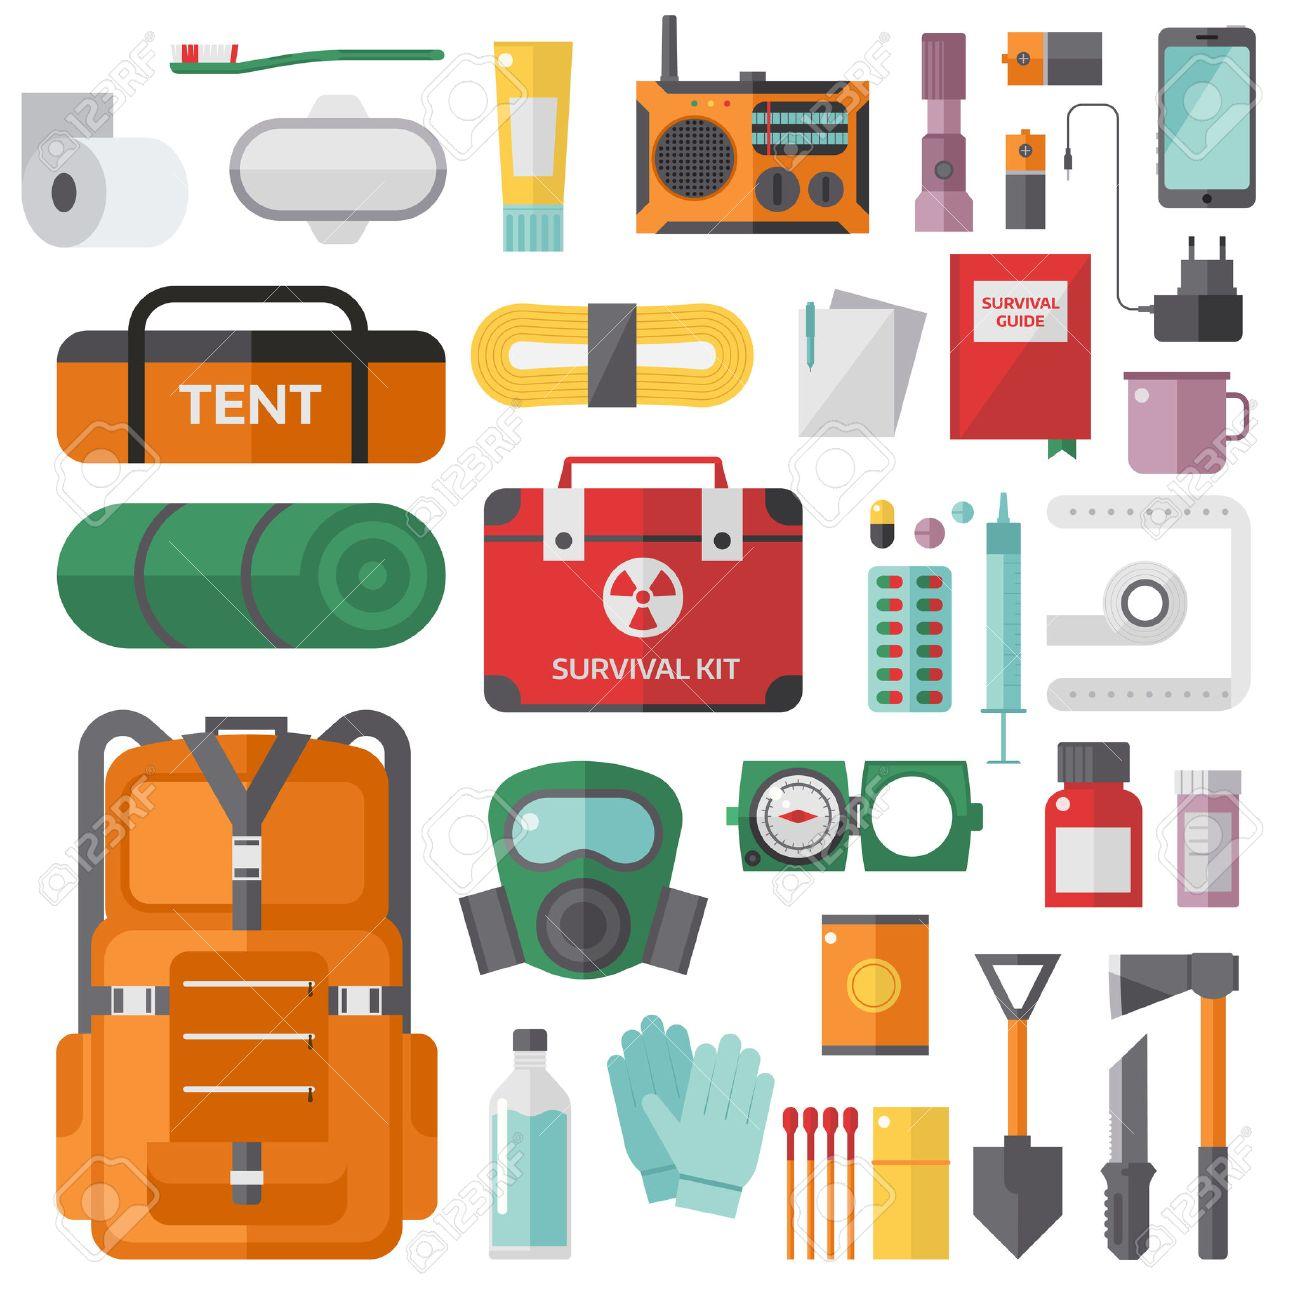 Emergency Kit Clipart.